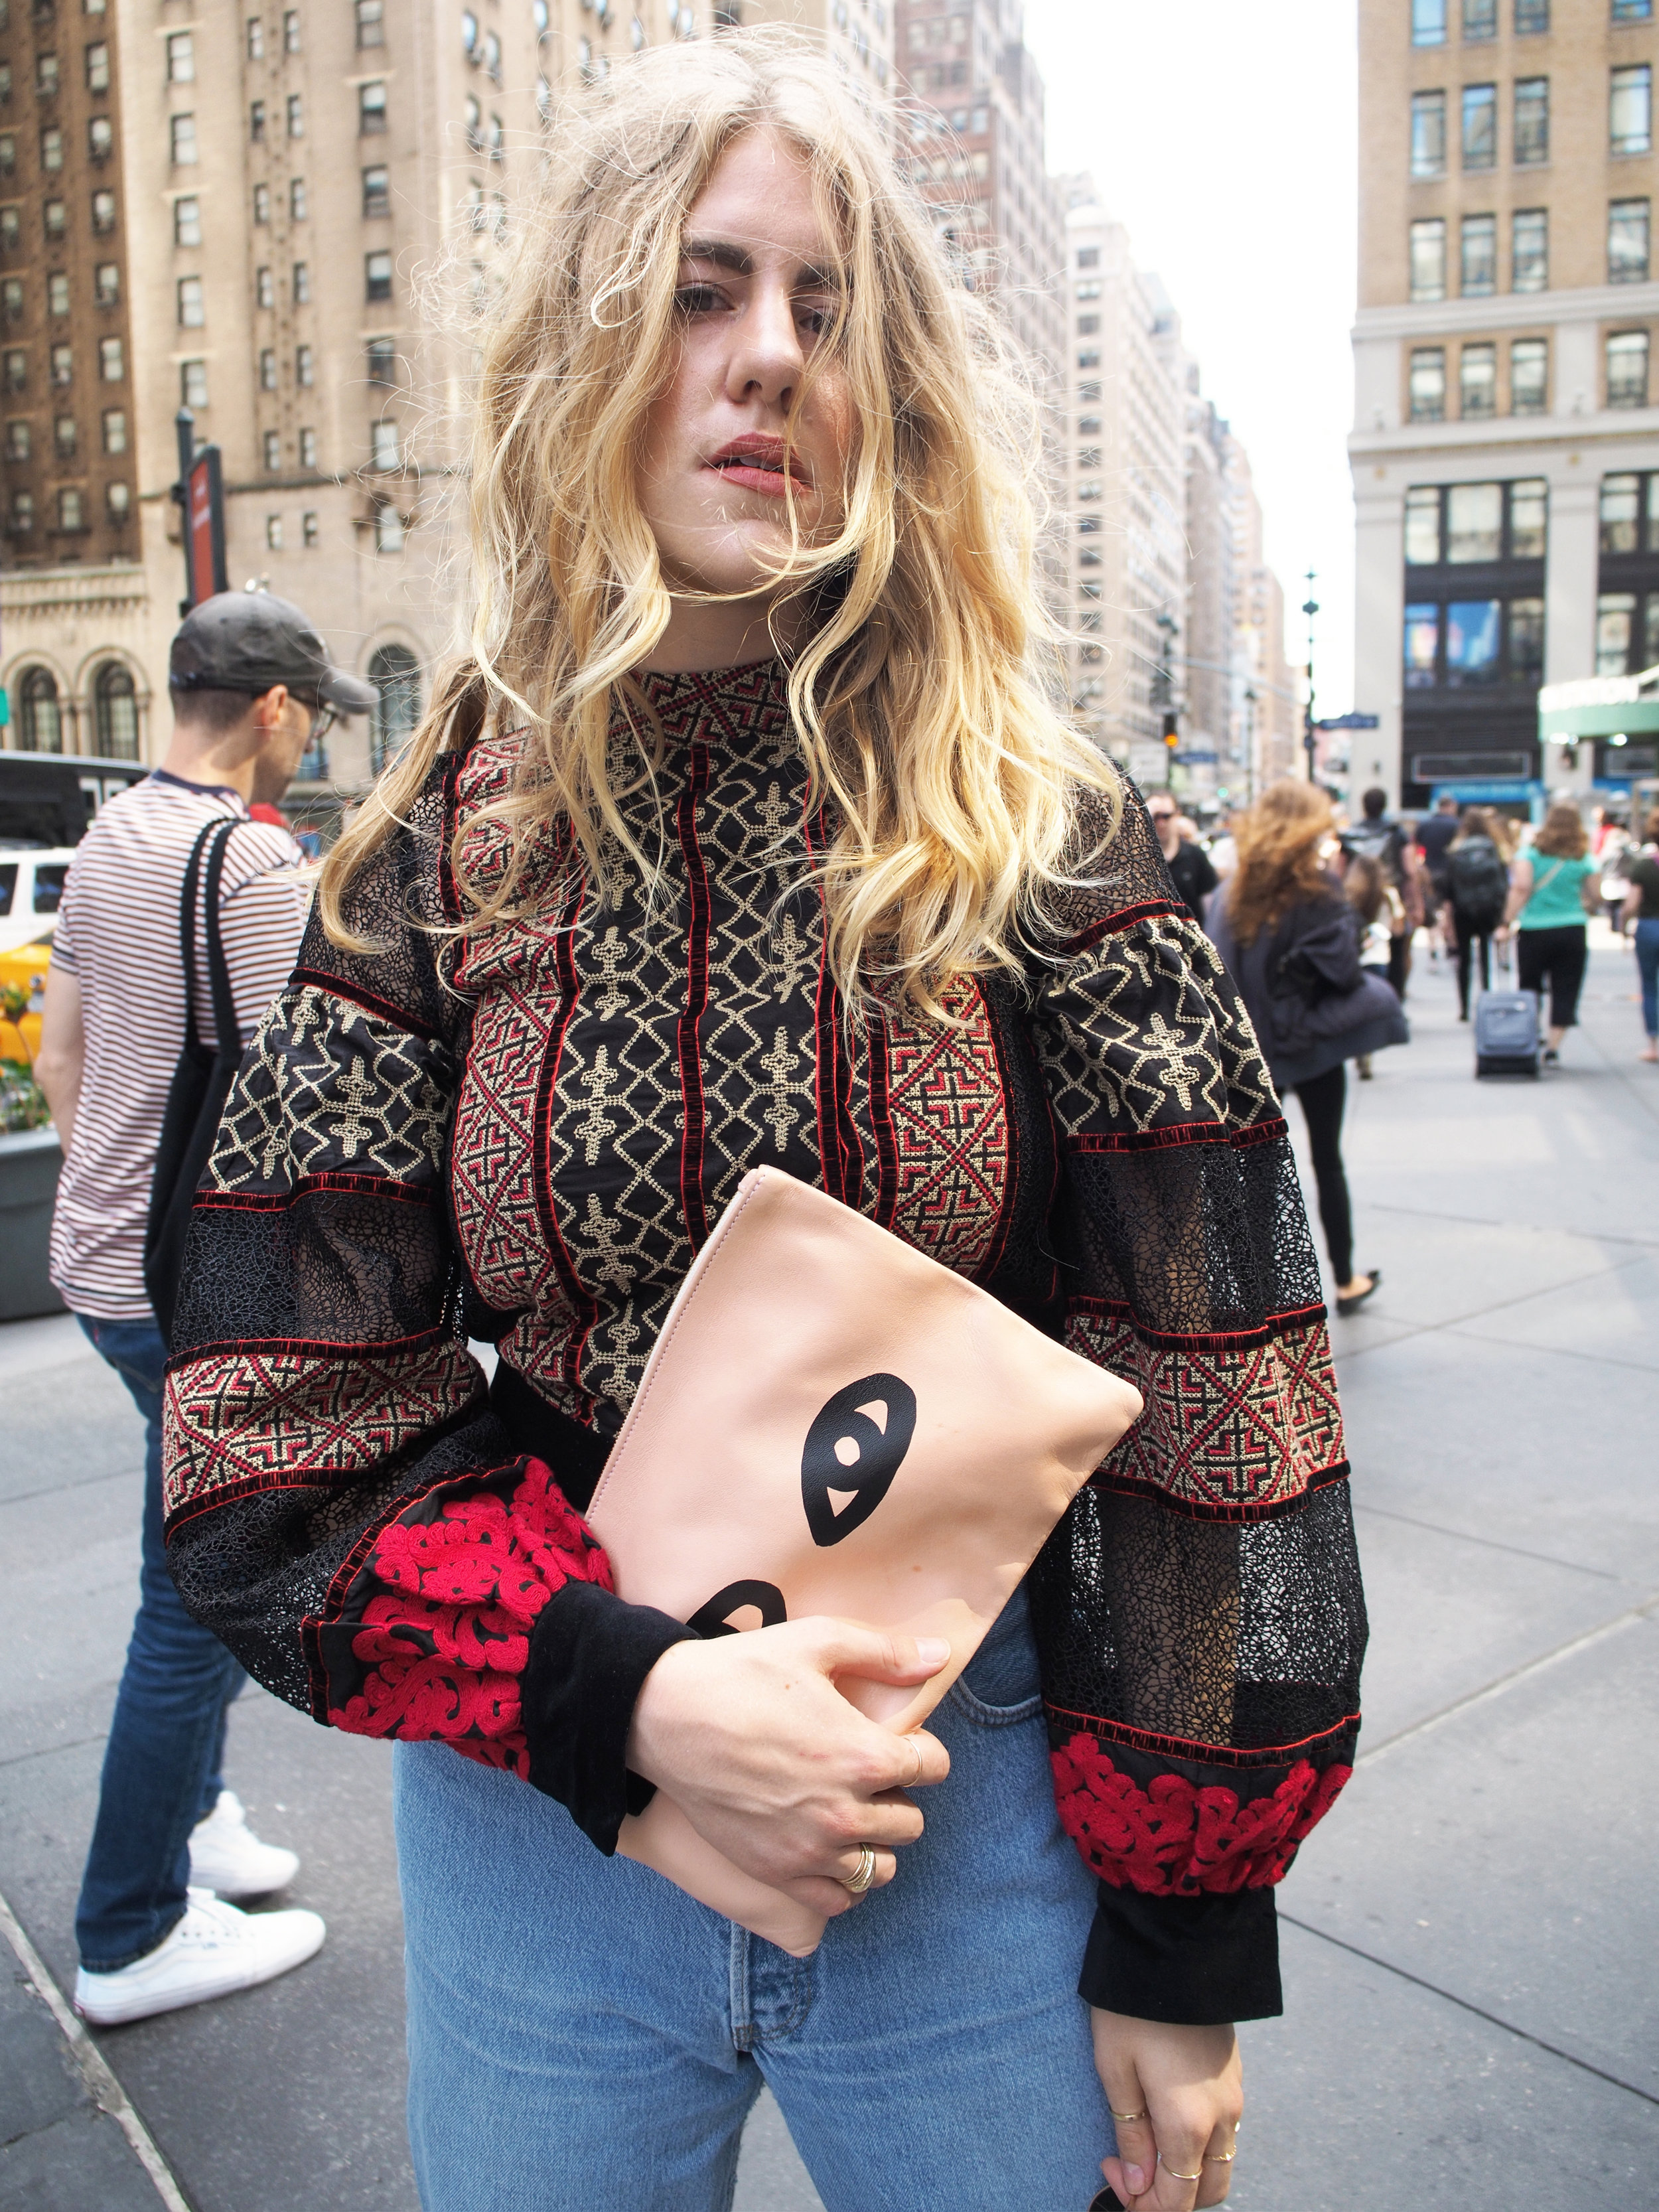 NYFW New York Fashion Week Day One Recap OOTD Backstage Taylr Anne www.taylranne.com